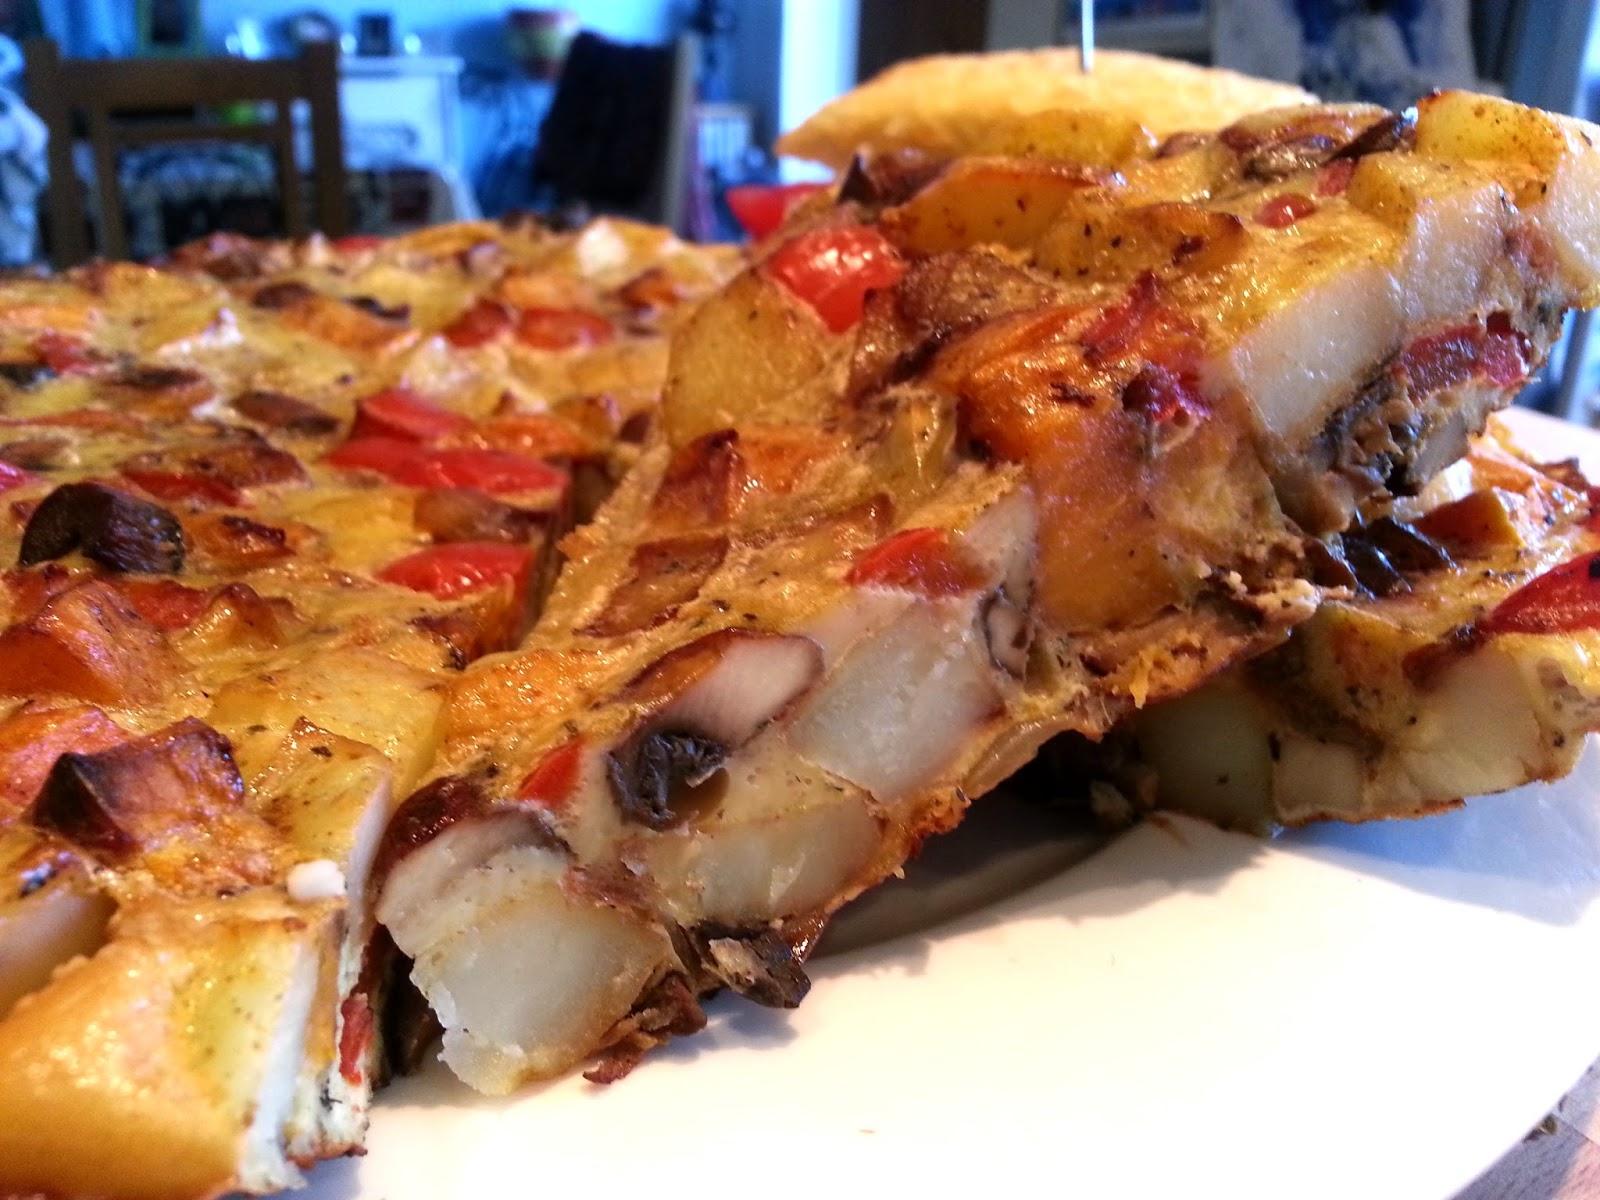 Slimming World Delights Roasted Vegetable Tortilla